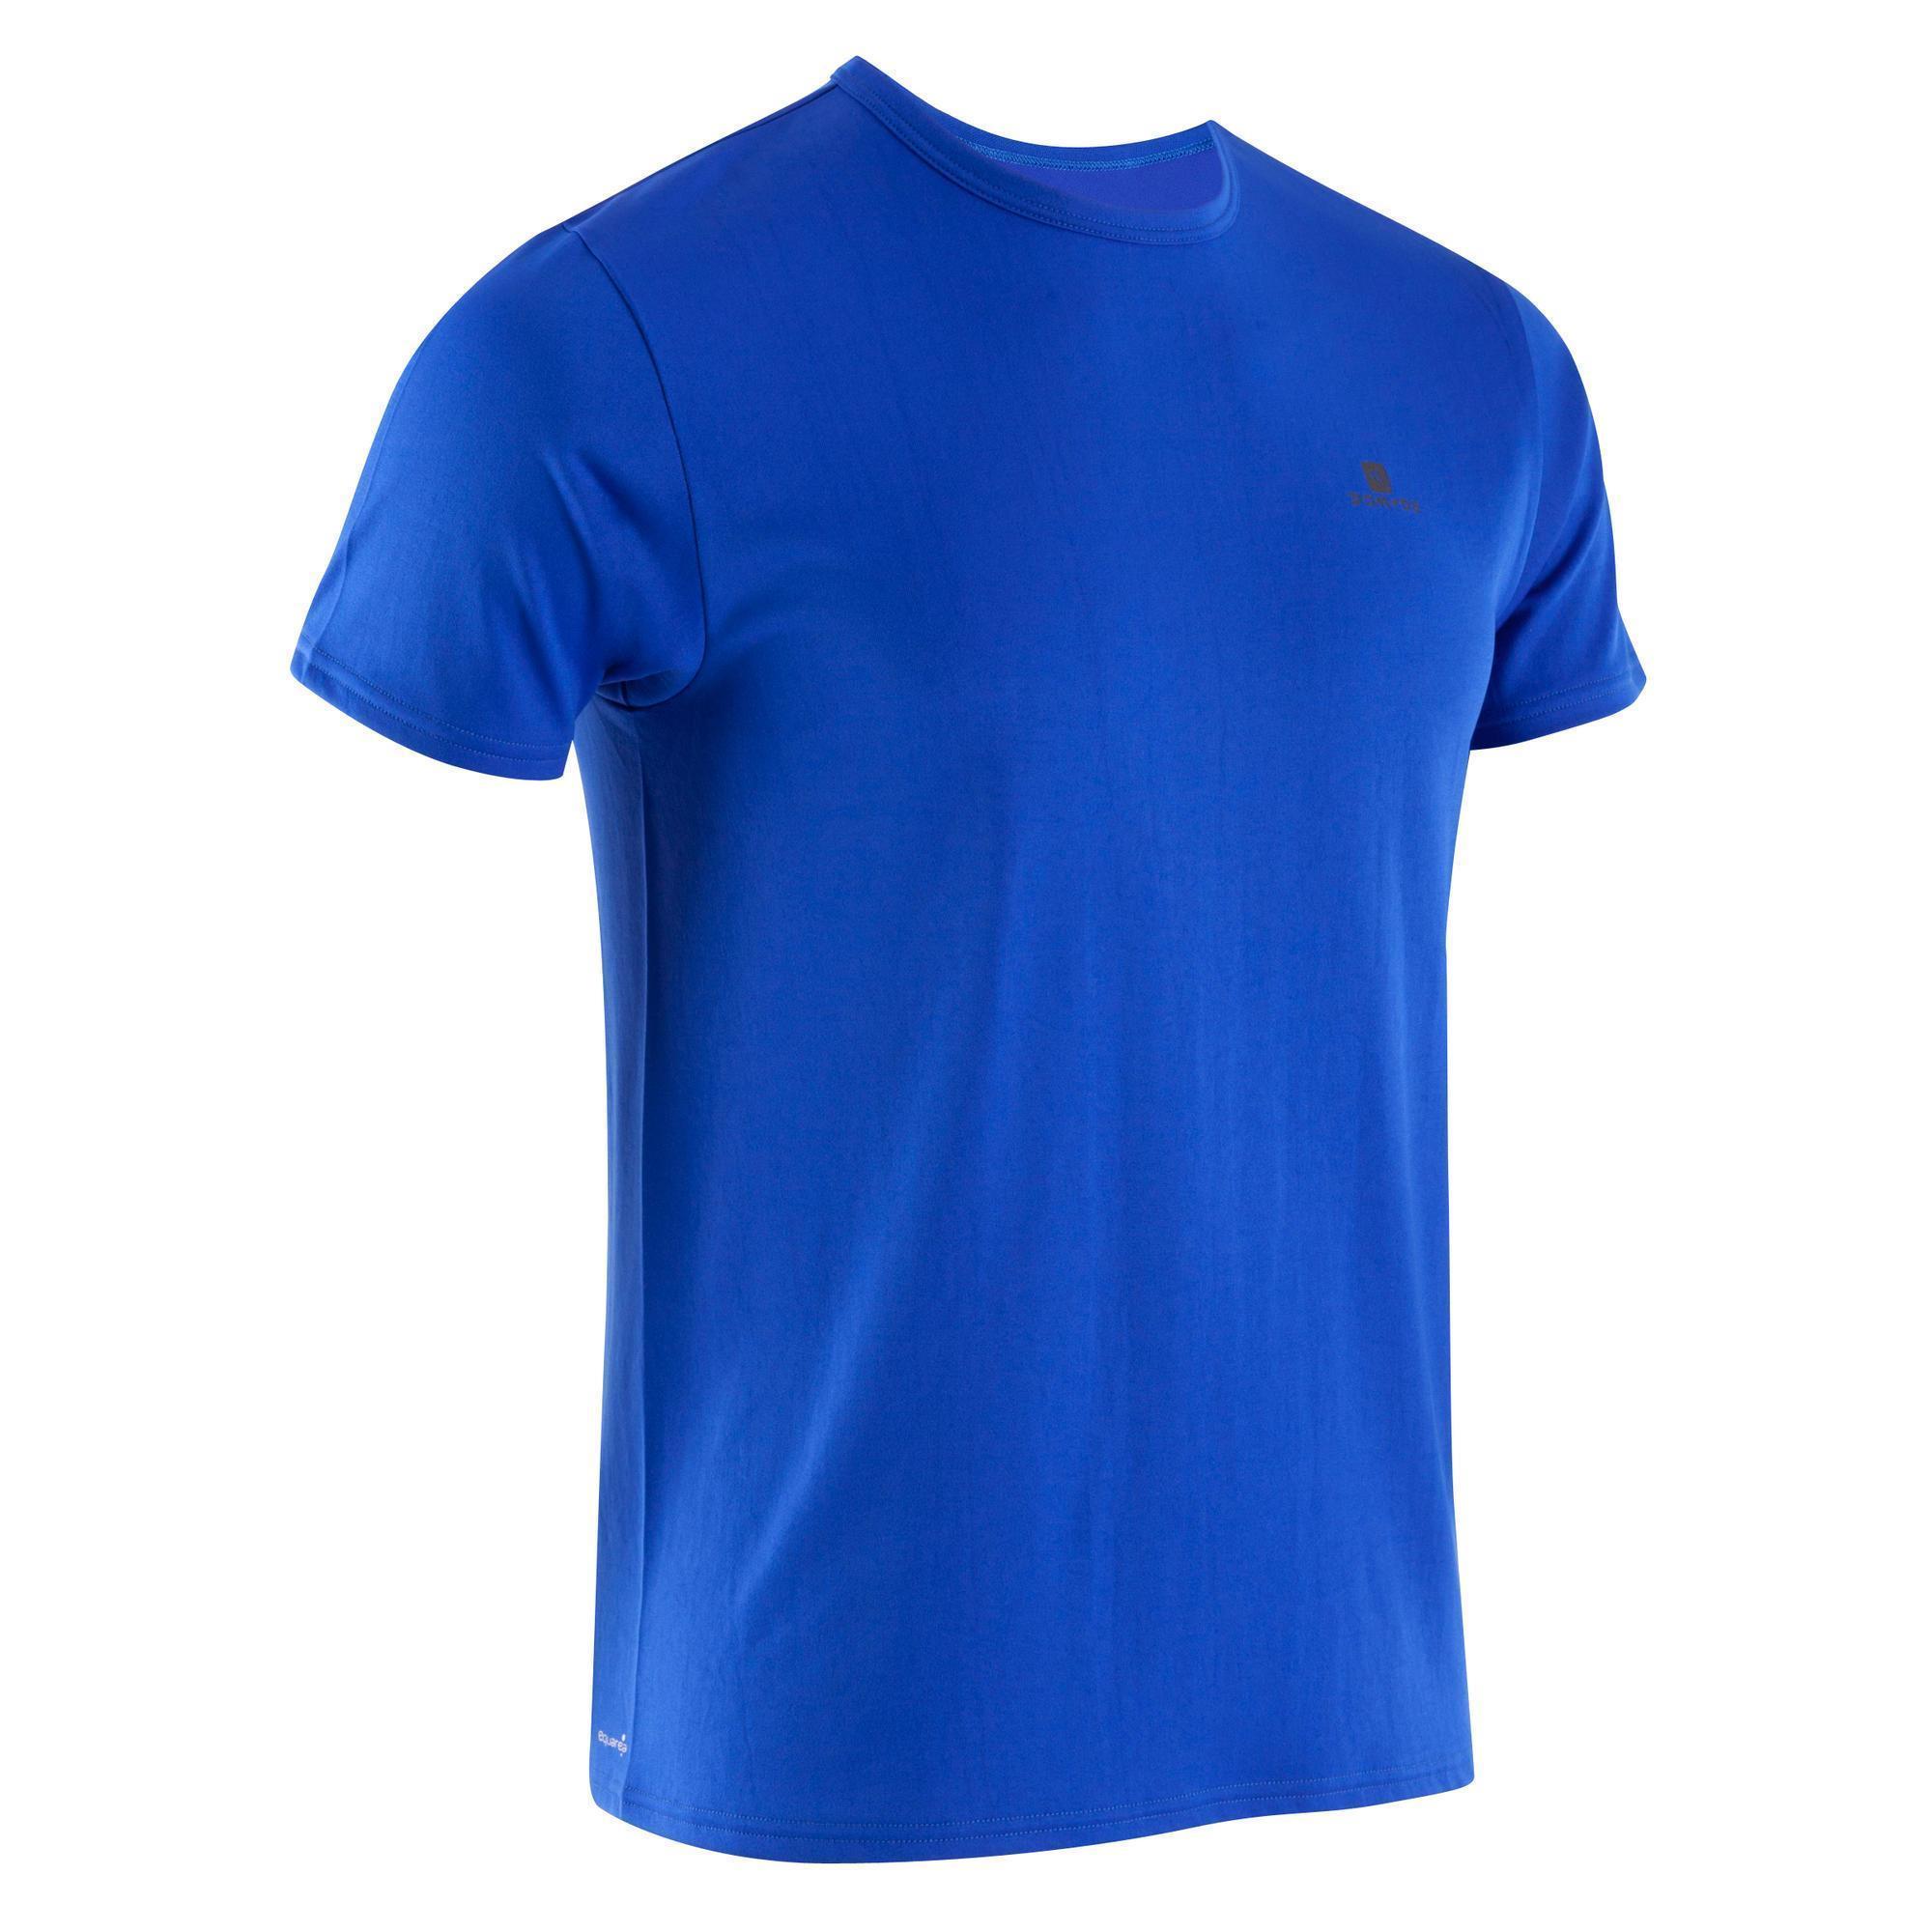 t shirt energy fitness homme bleu domyos by decathlon. Black Bedroom Furniture Sets. Home Design Ideas